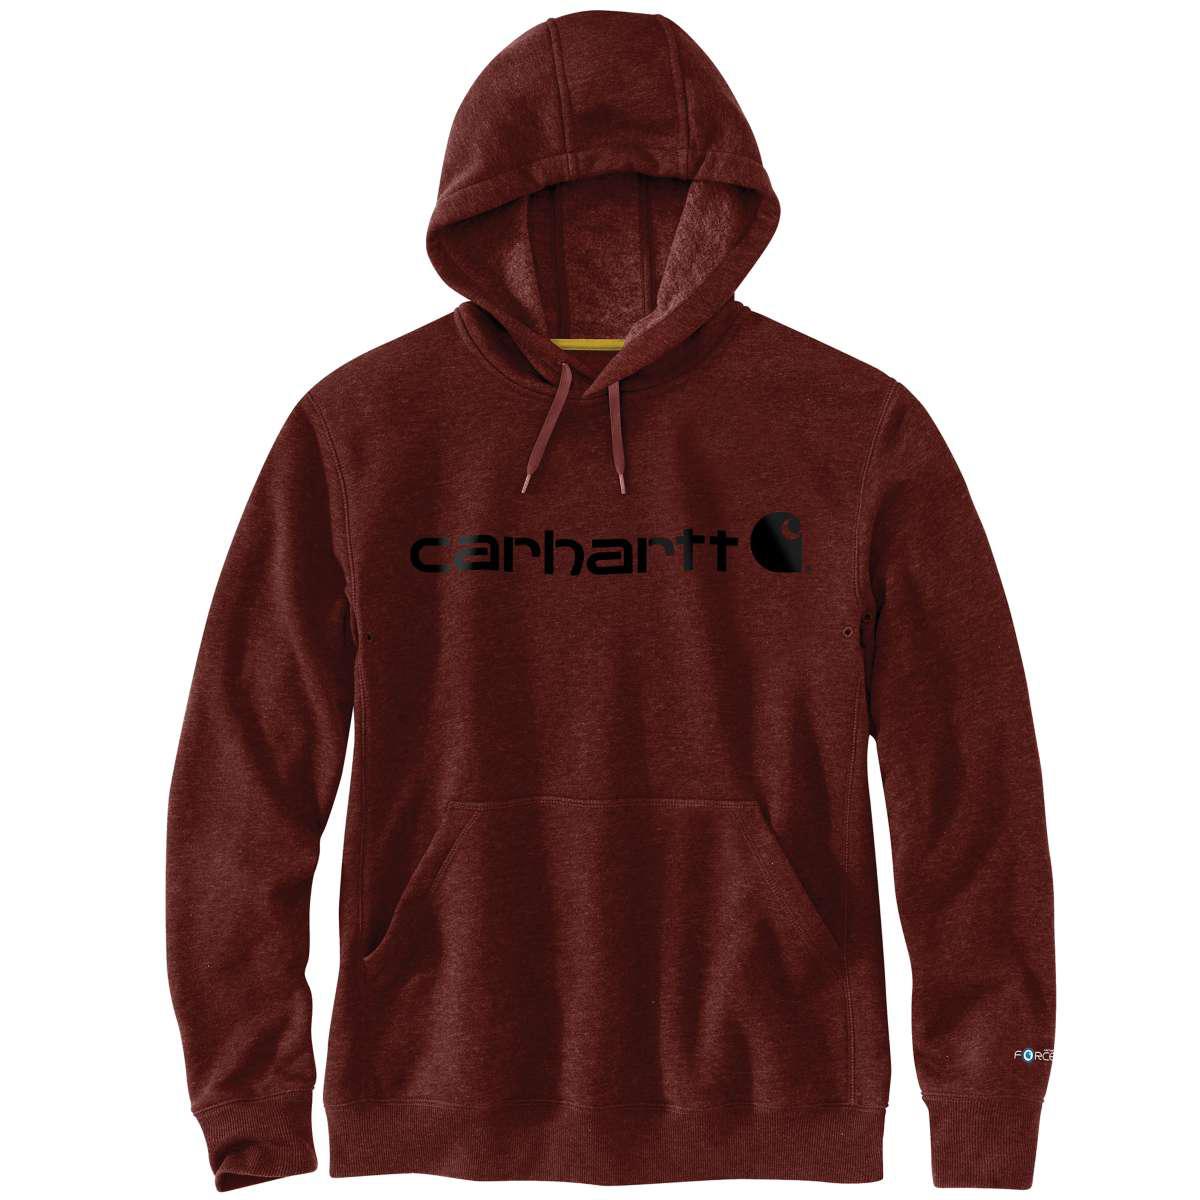 Carhartt Men's Delmont Signature Graphic Hoooded Sweatshirt - Red, S